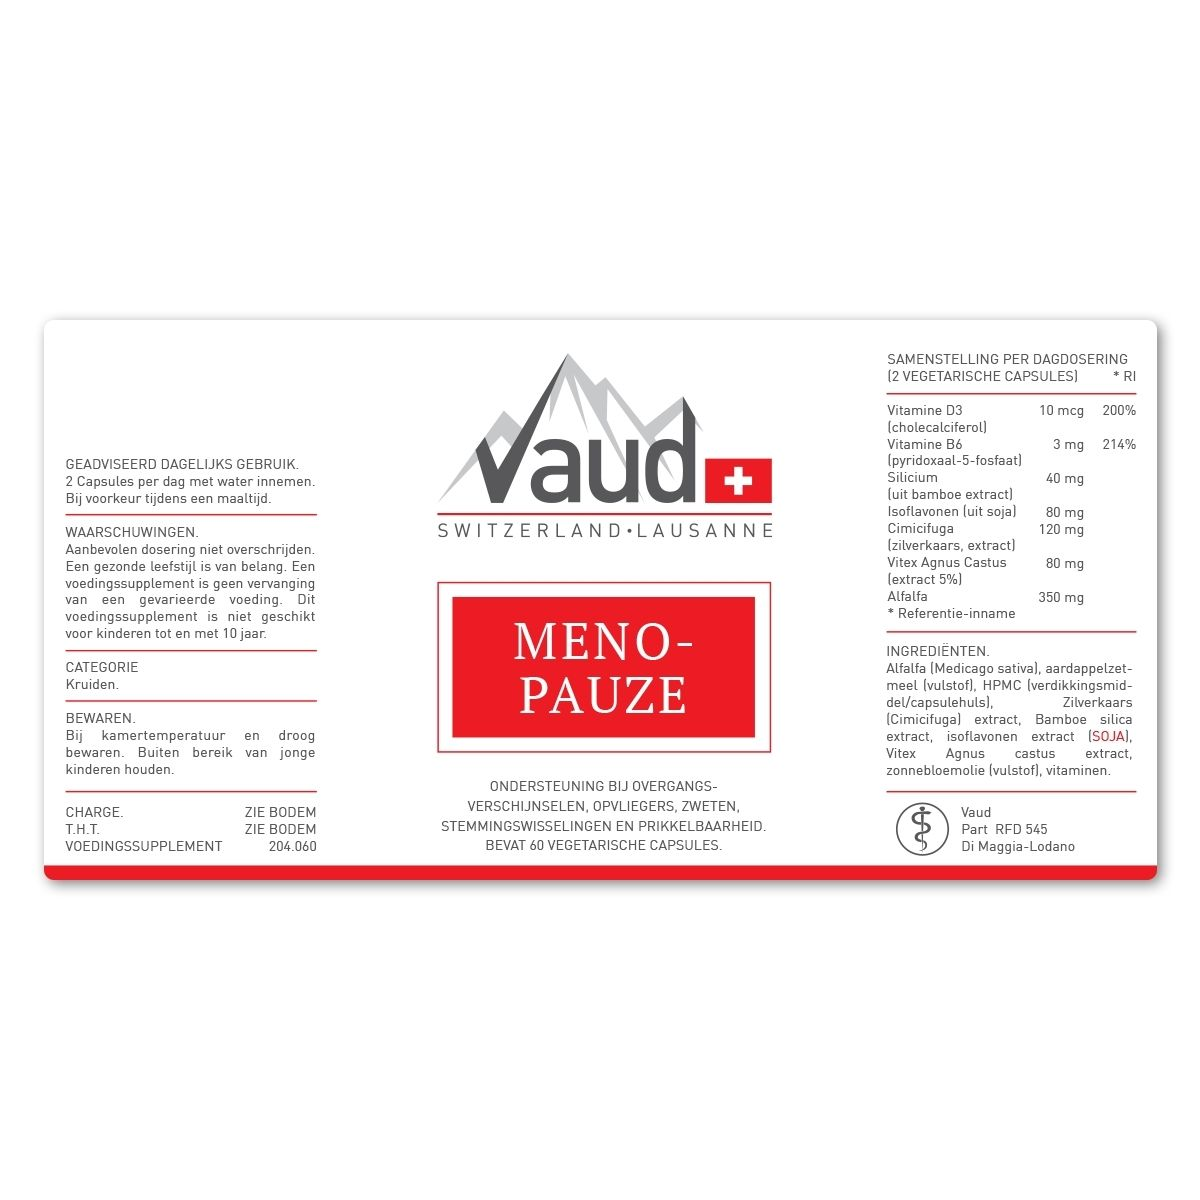 menopauze label